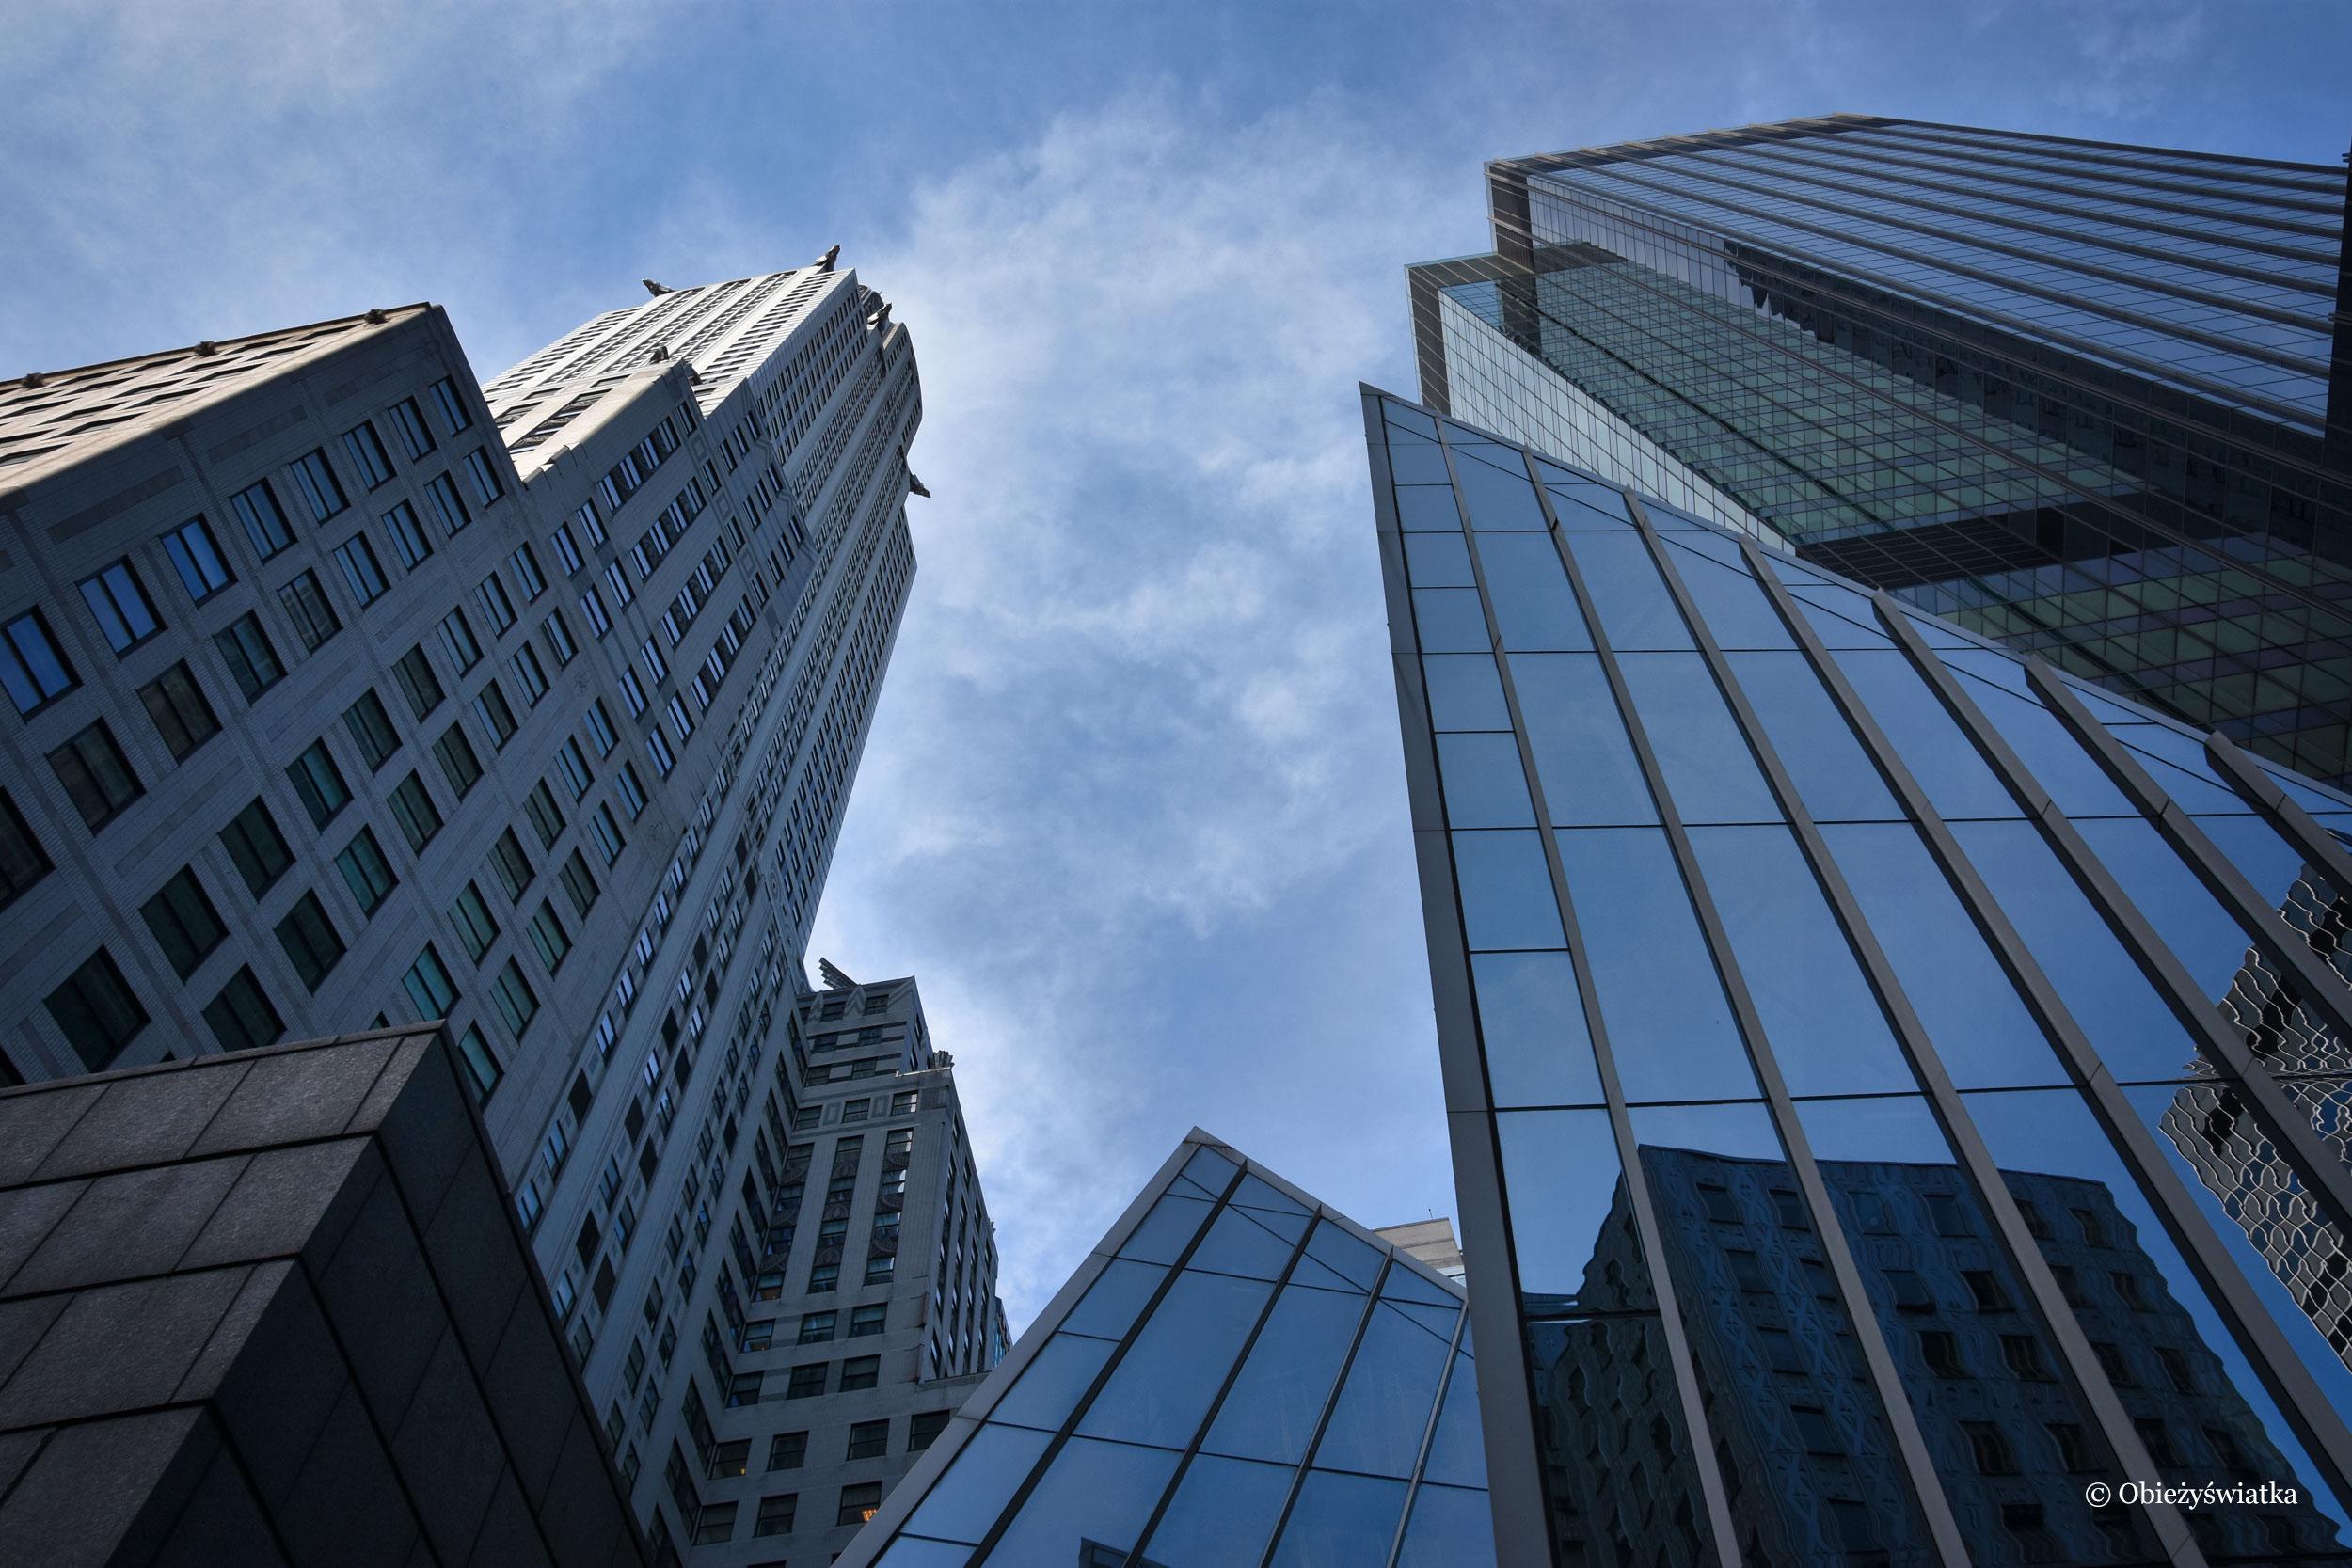 Wśród drapaczy chmur - Chrysler Building, Nowy Jork